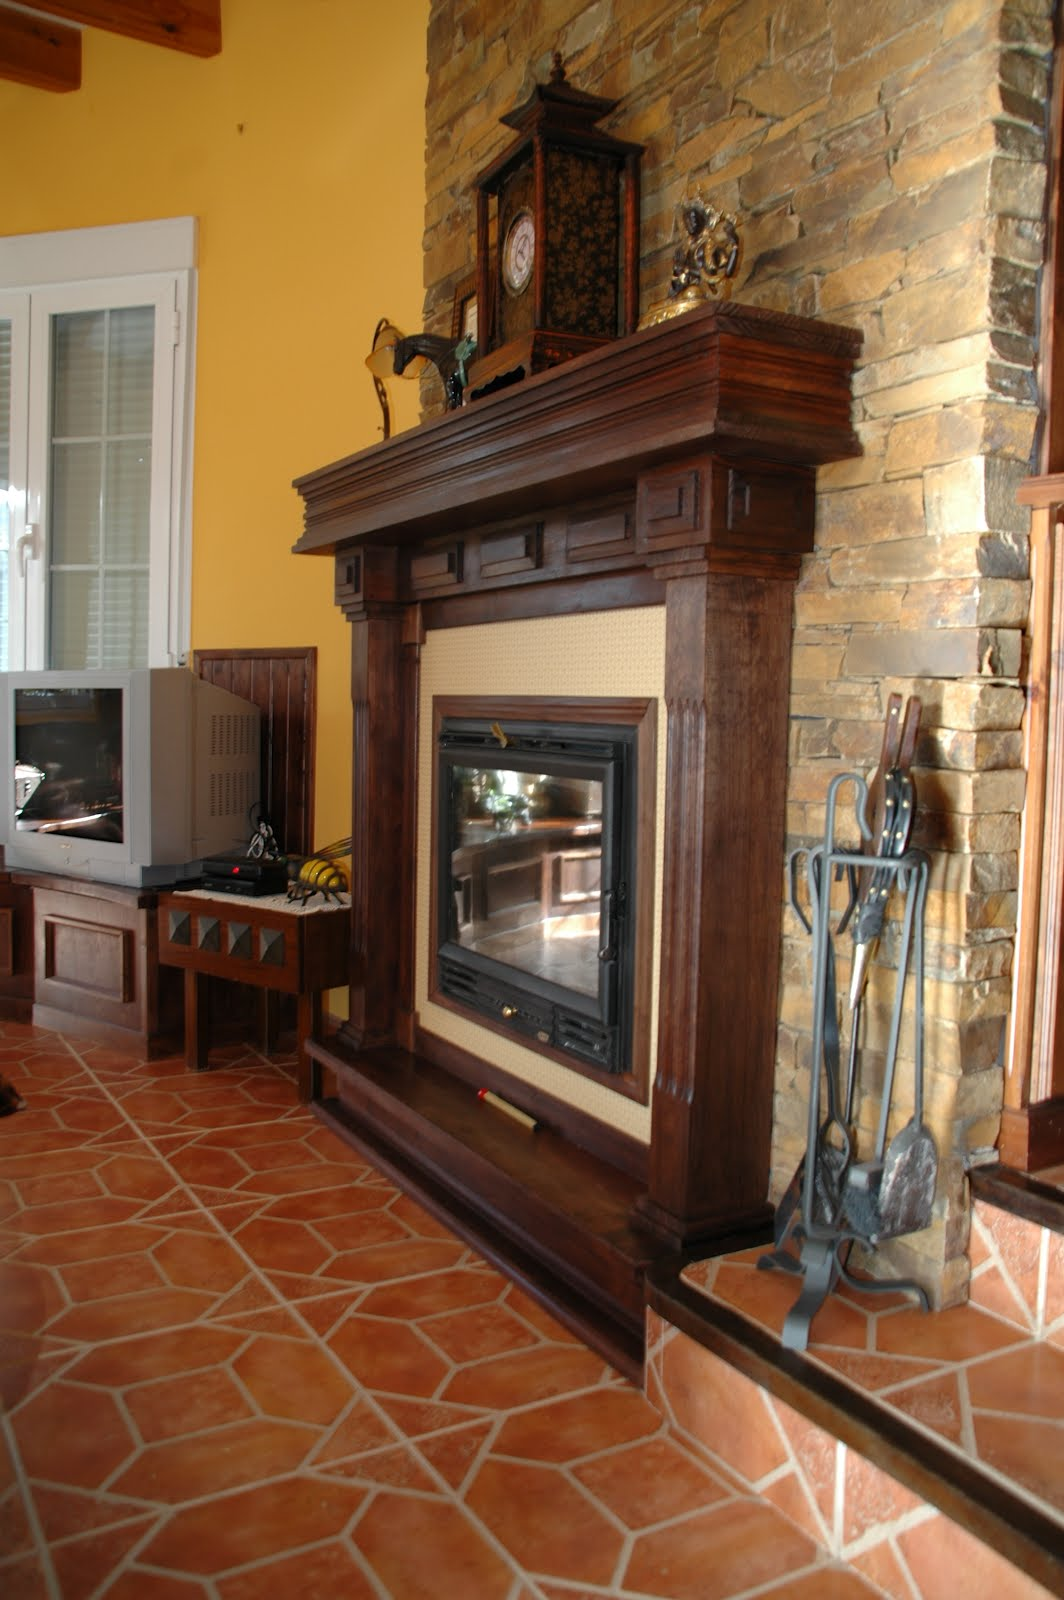 Carpinteria viosca roda decoraci n de chimenea - Madera para chimenea ...